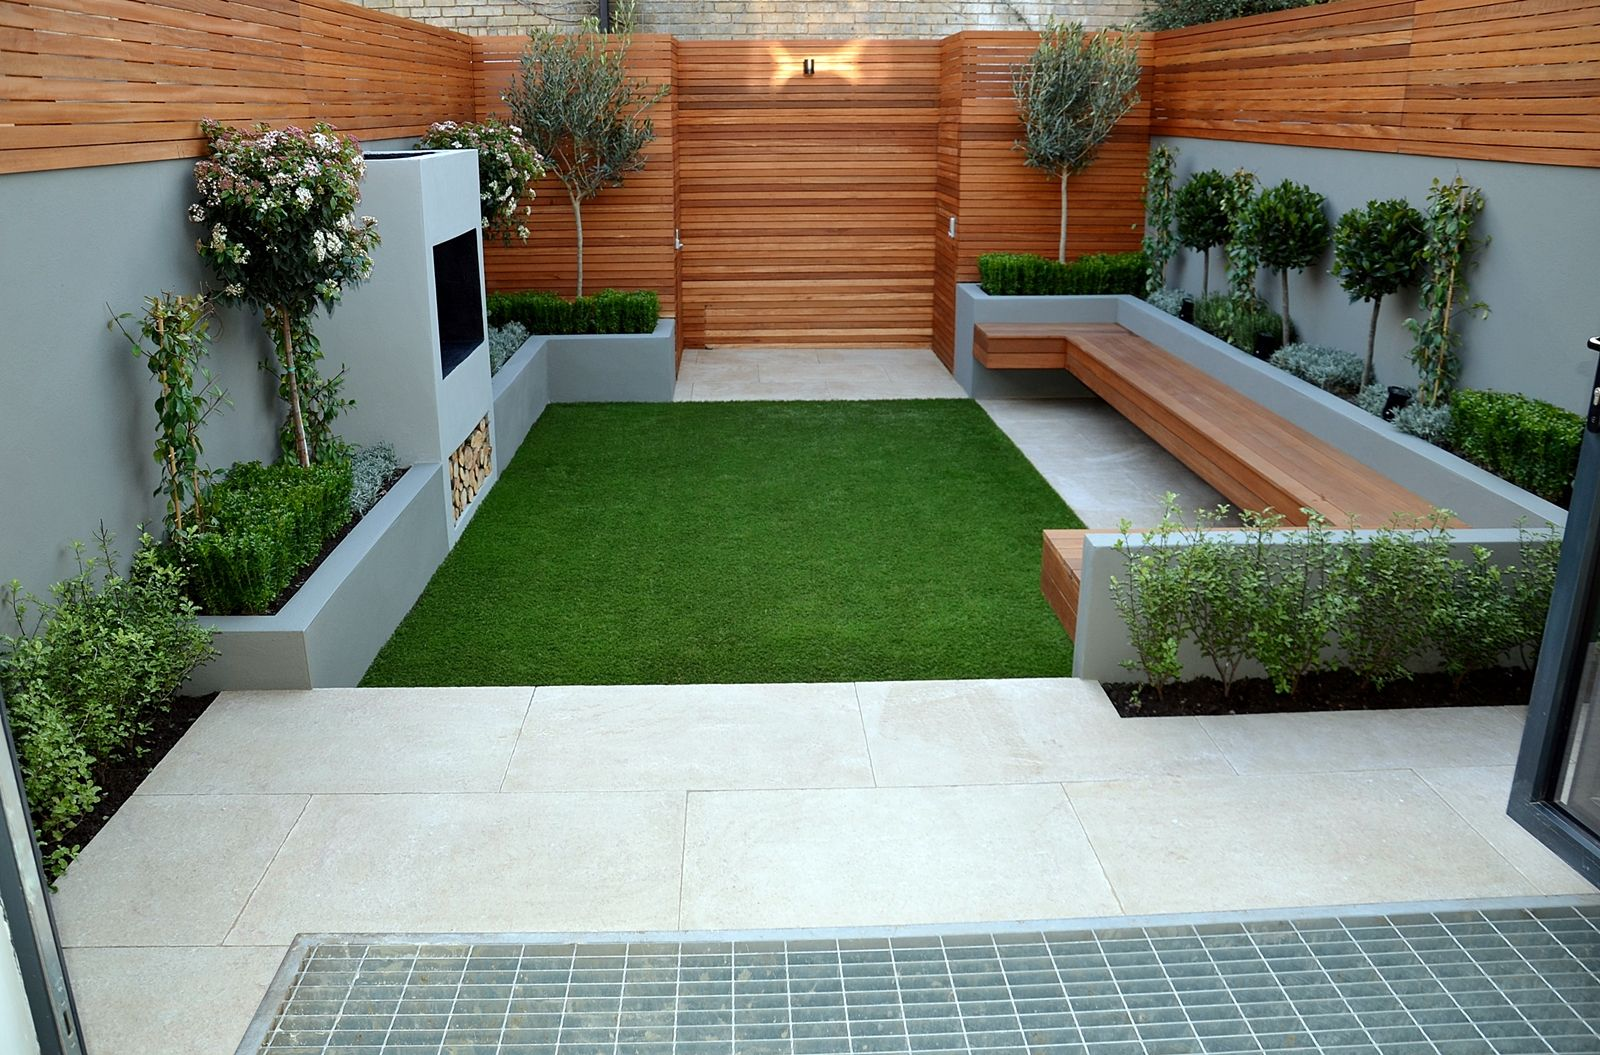 Fullsize Of Garden Landscape Photos